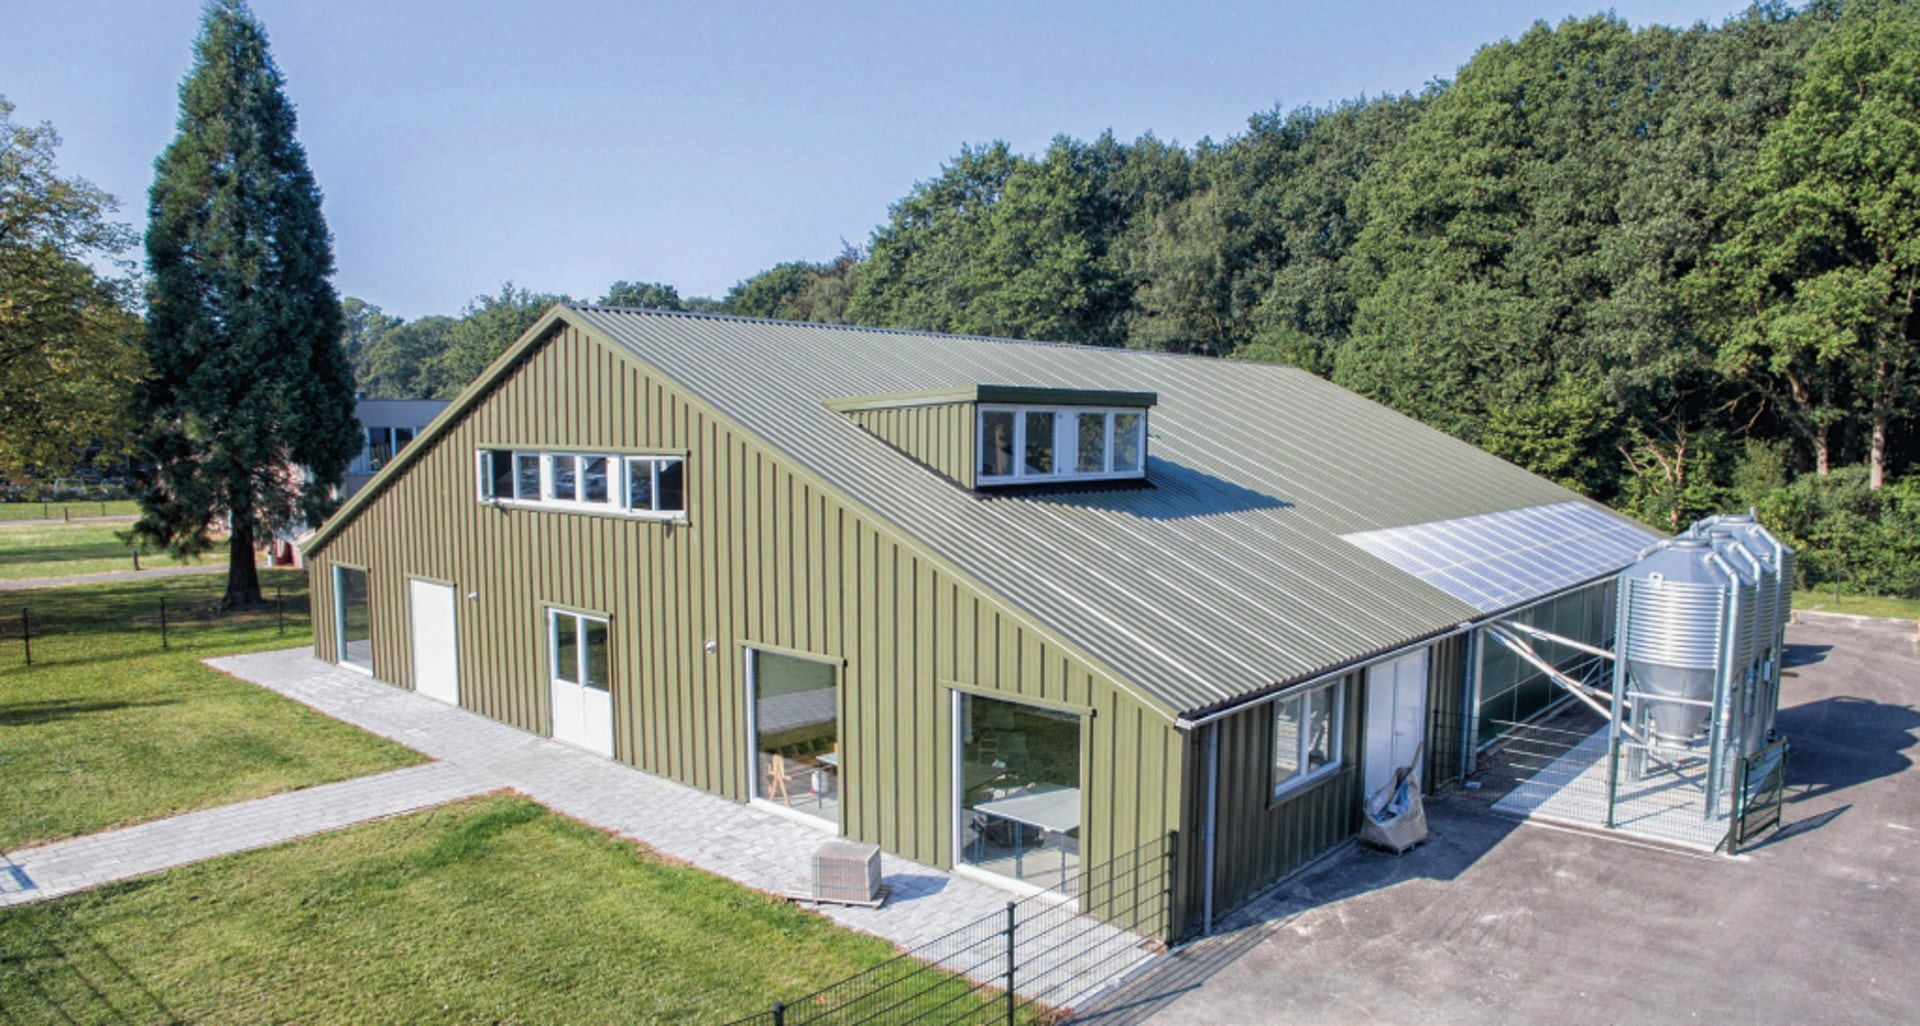 Netherlands6-Opening-Poultry-Innovation-Lab.jpg